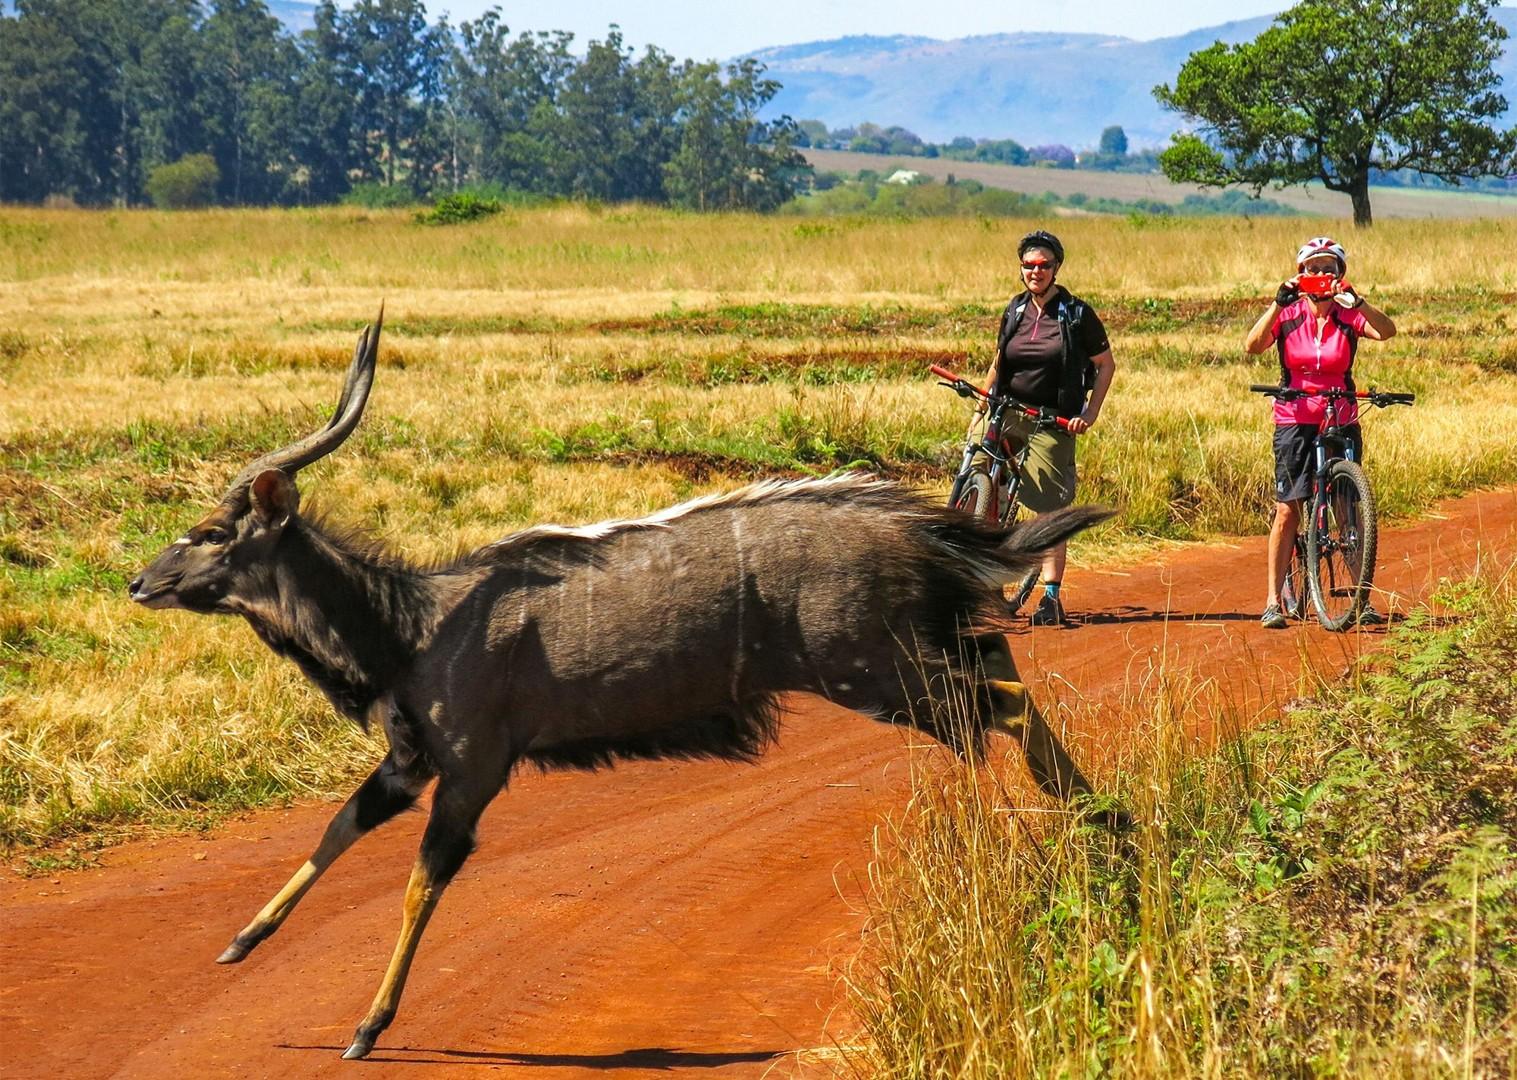 rgfdgfg15.jpg - Eswatini (Swaziland) - Cycling Safari - Cycling Adventures